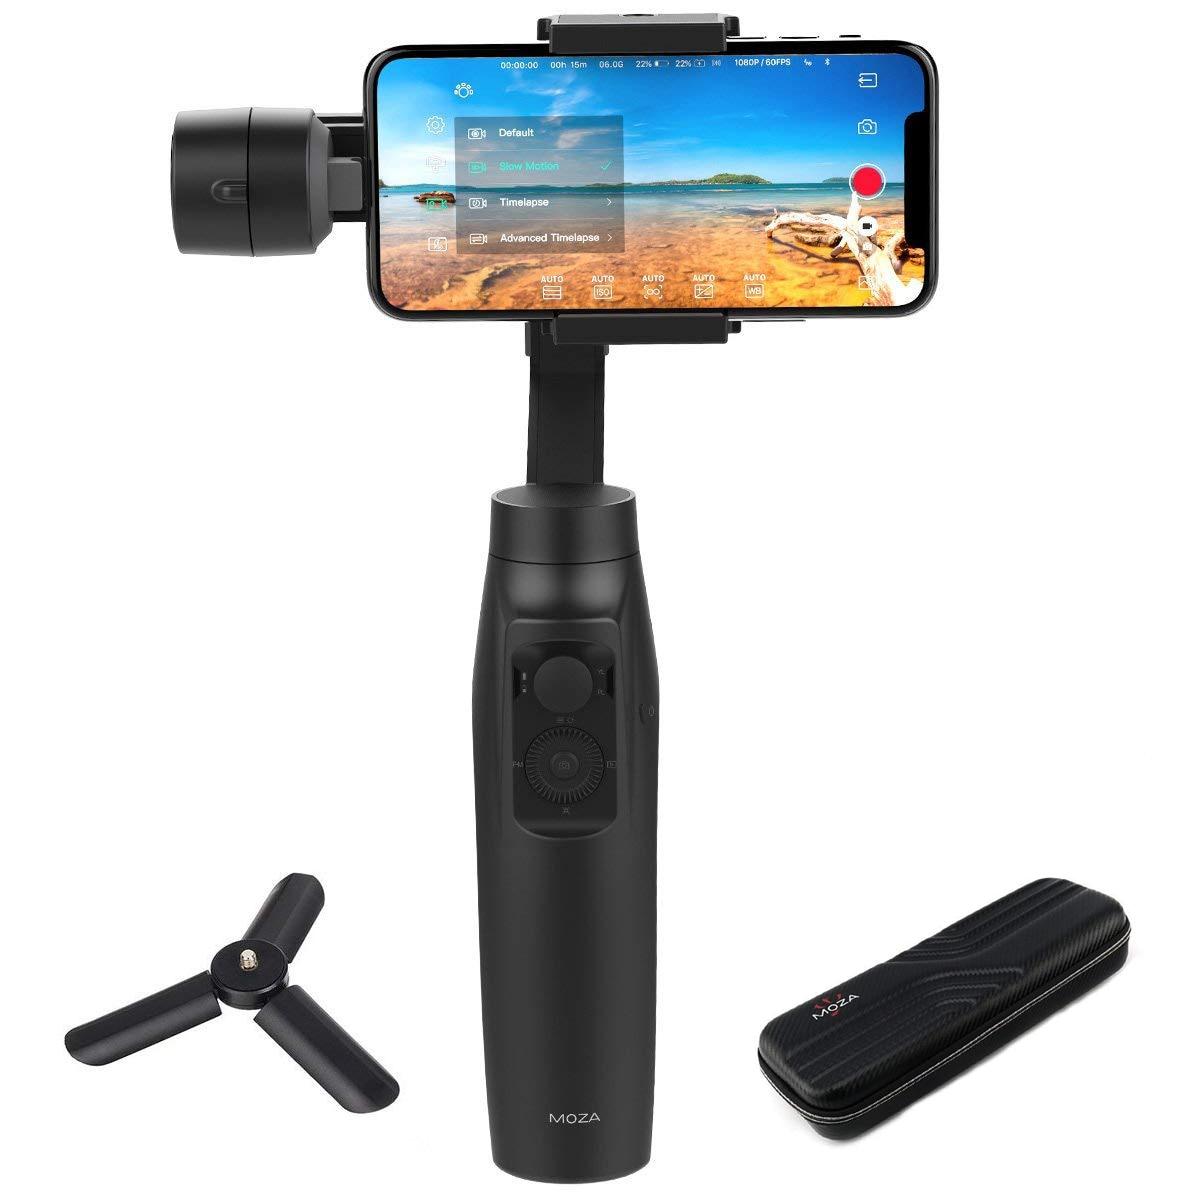 Stabilisateur de cardan tenu dans la main de MOZA mi ni mi ni-mi 3 axes pour Huawei Mate 20 10 pour Samsung Galaxy S8, S9 Note 8,9 pour Xiao mi 8,7, 6